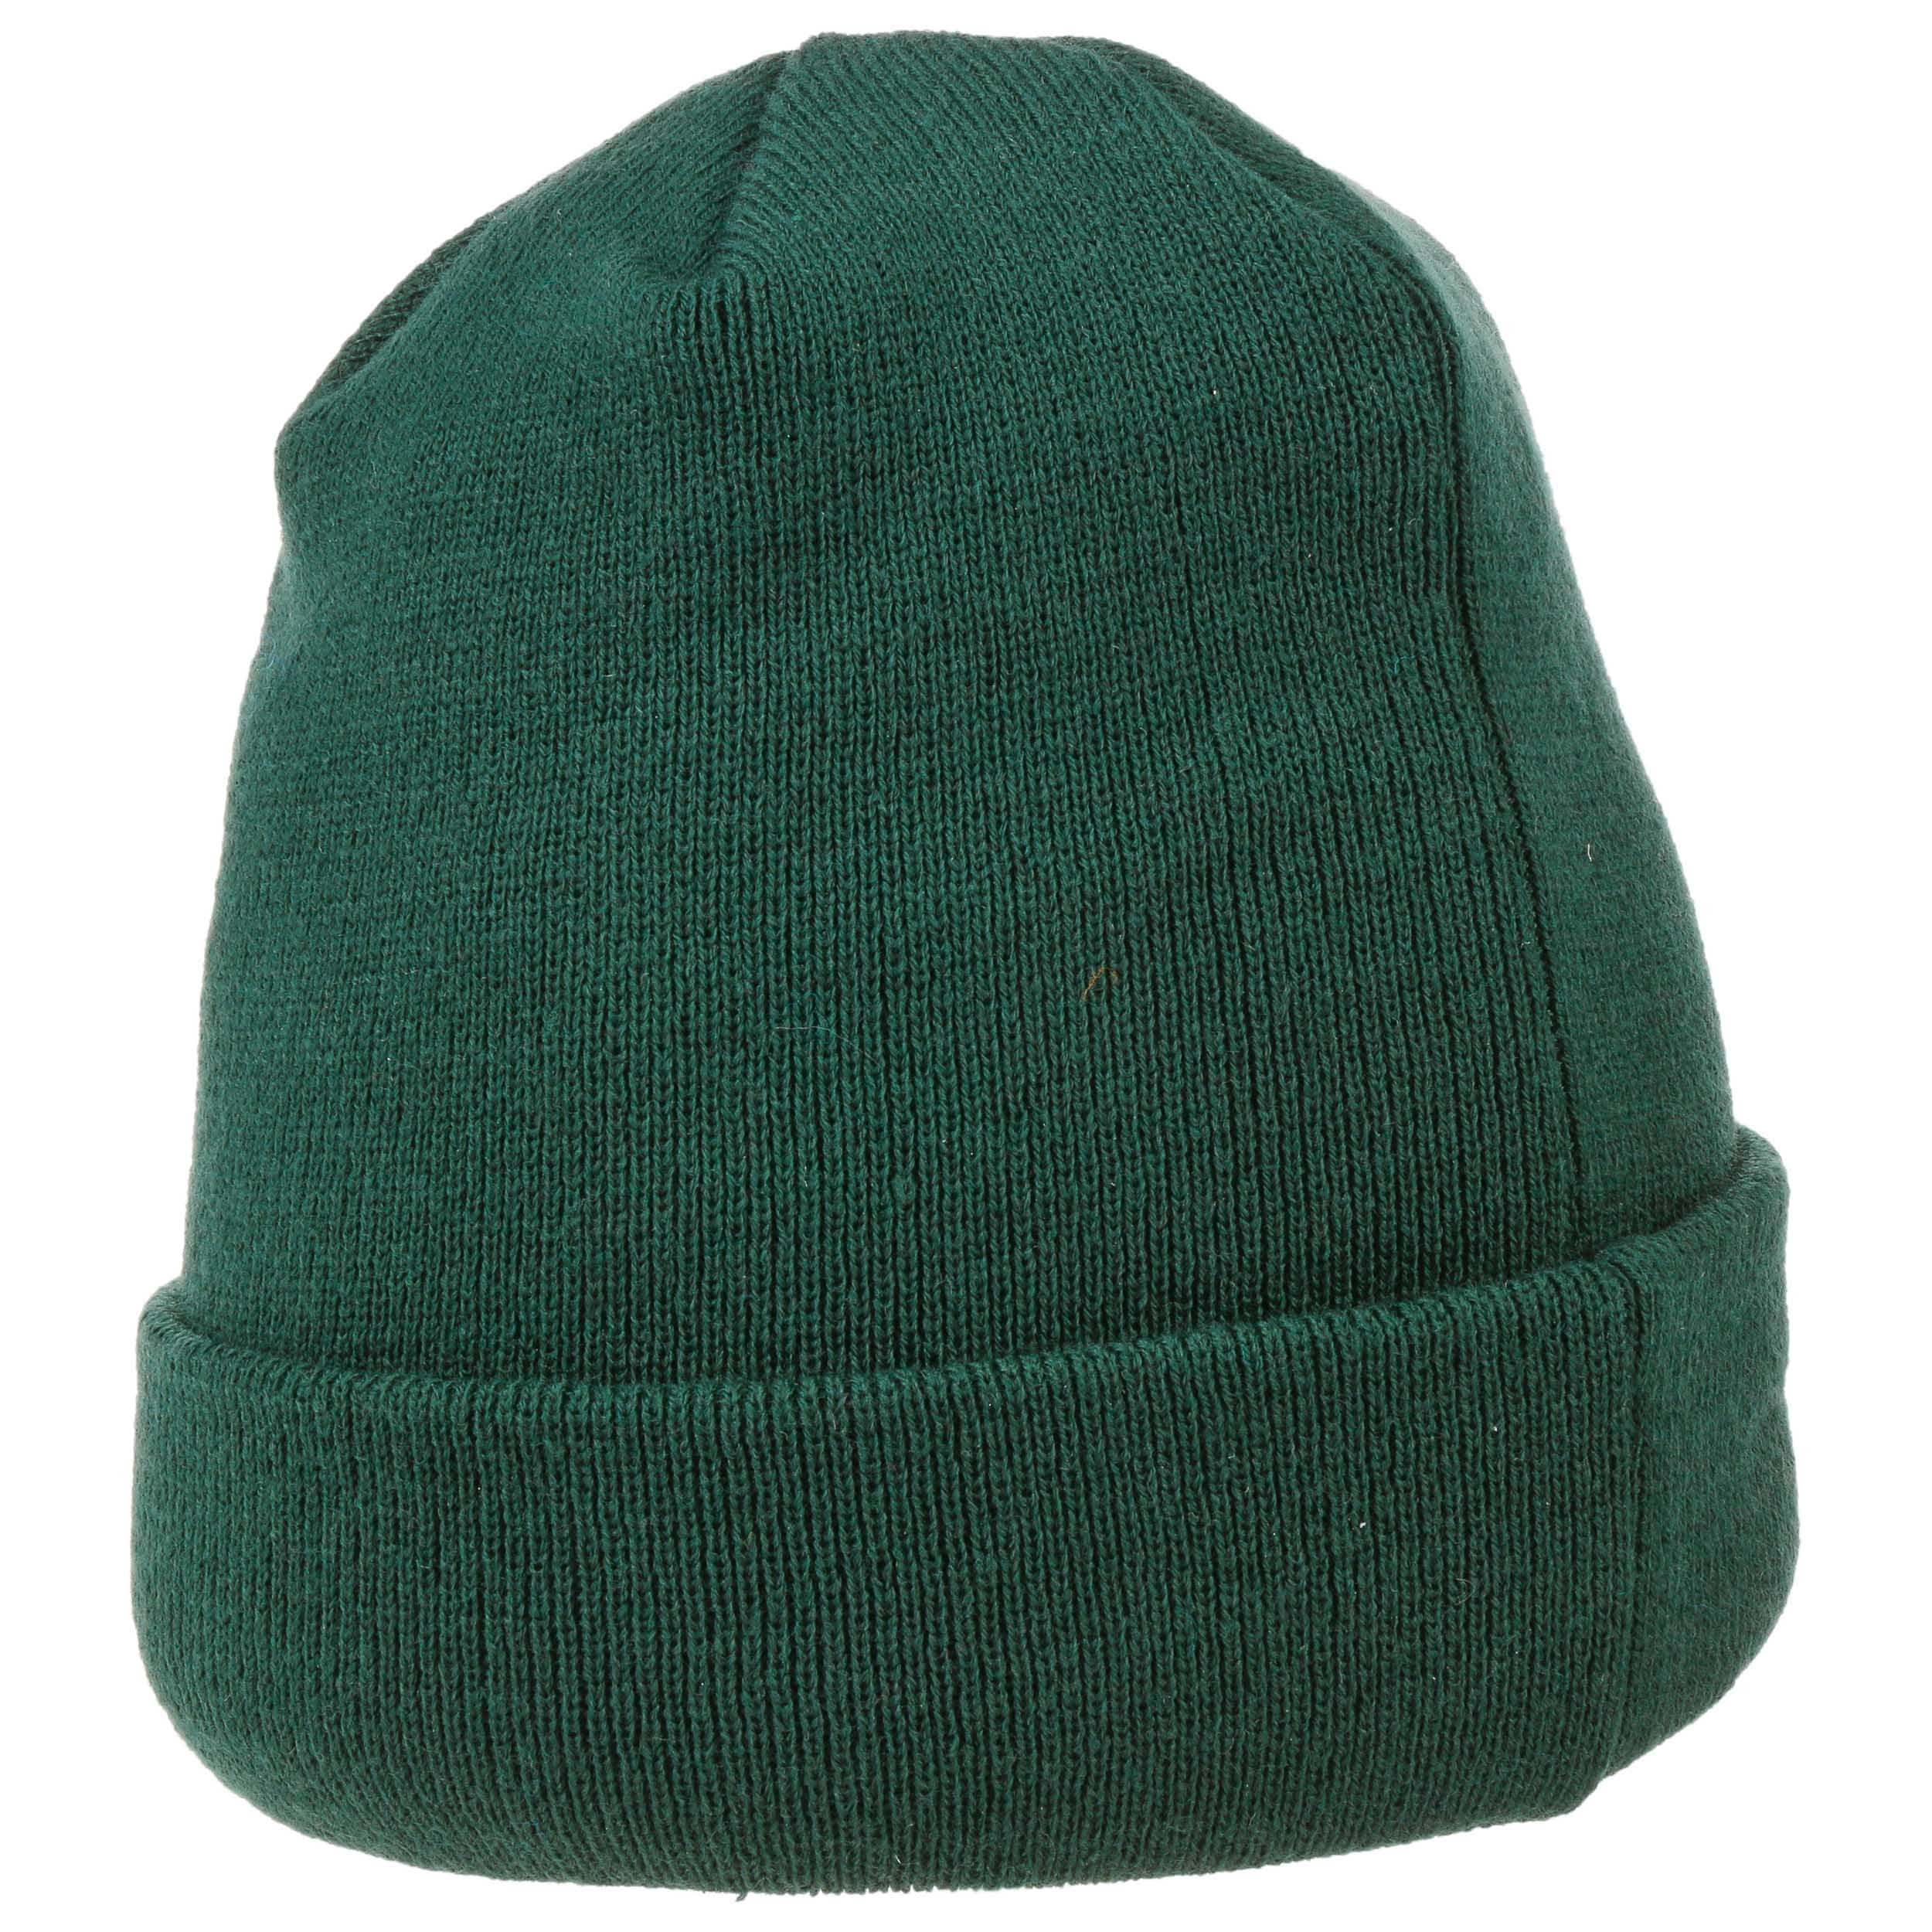 Ess Yankees Knit Beanie by New Era - dark green 1 ... c80a7083ef4